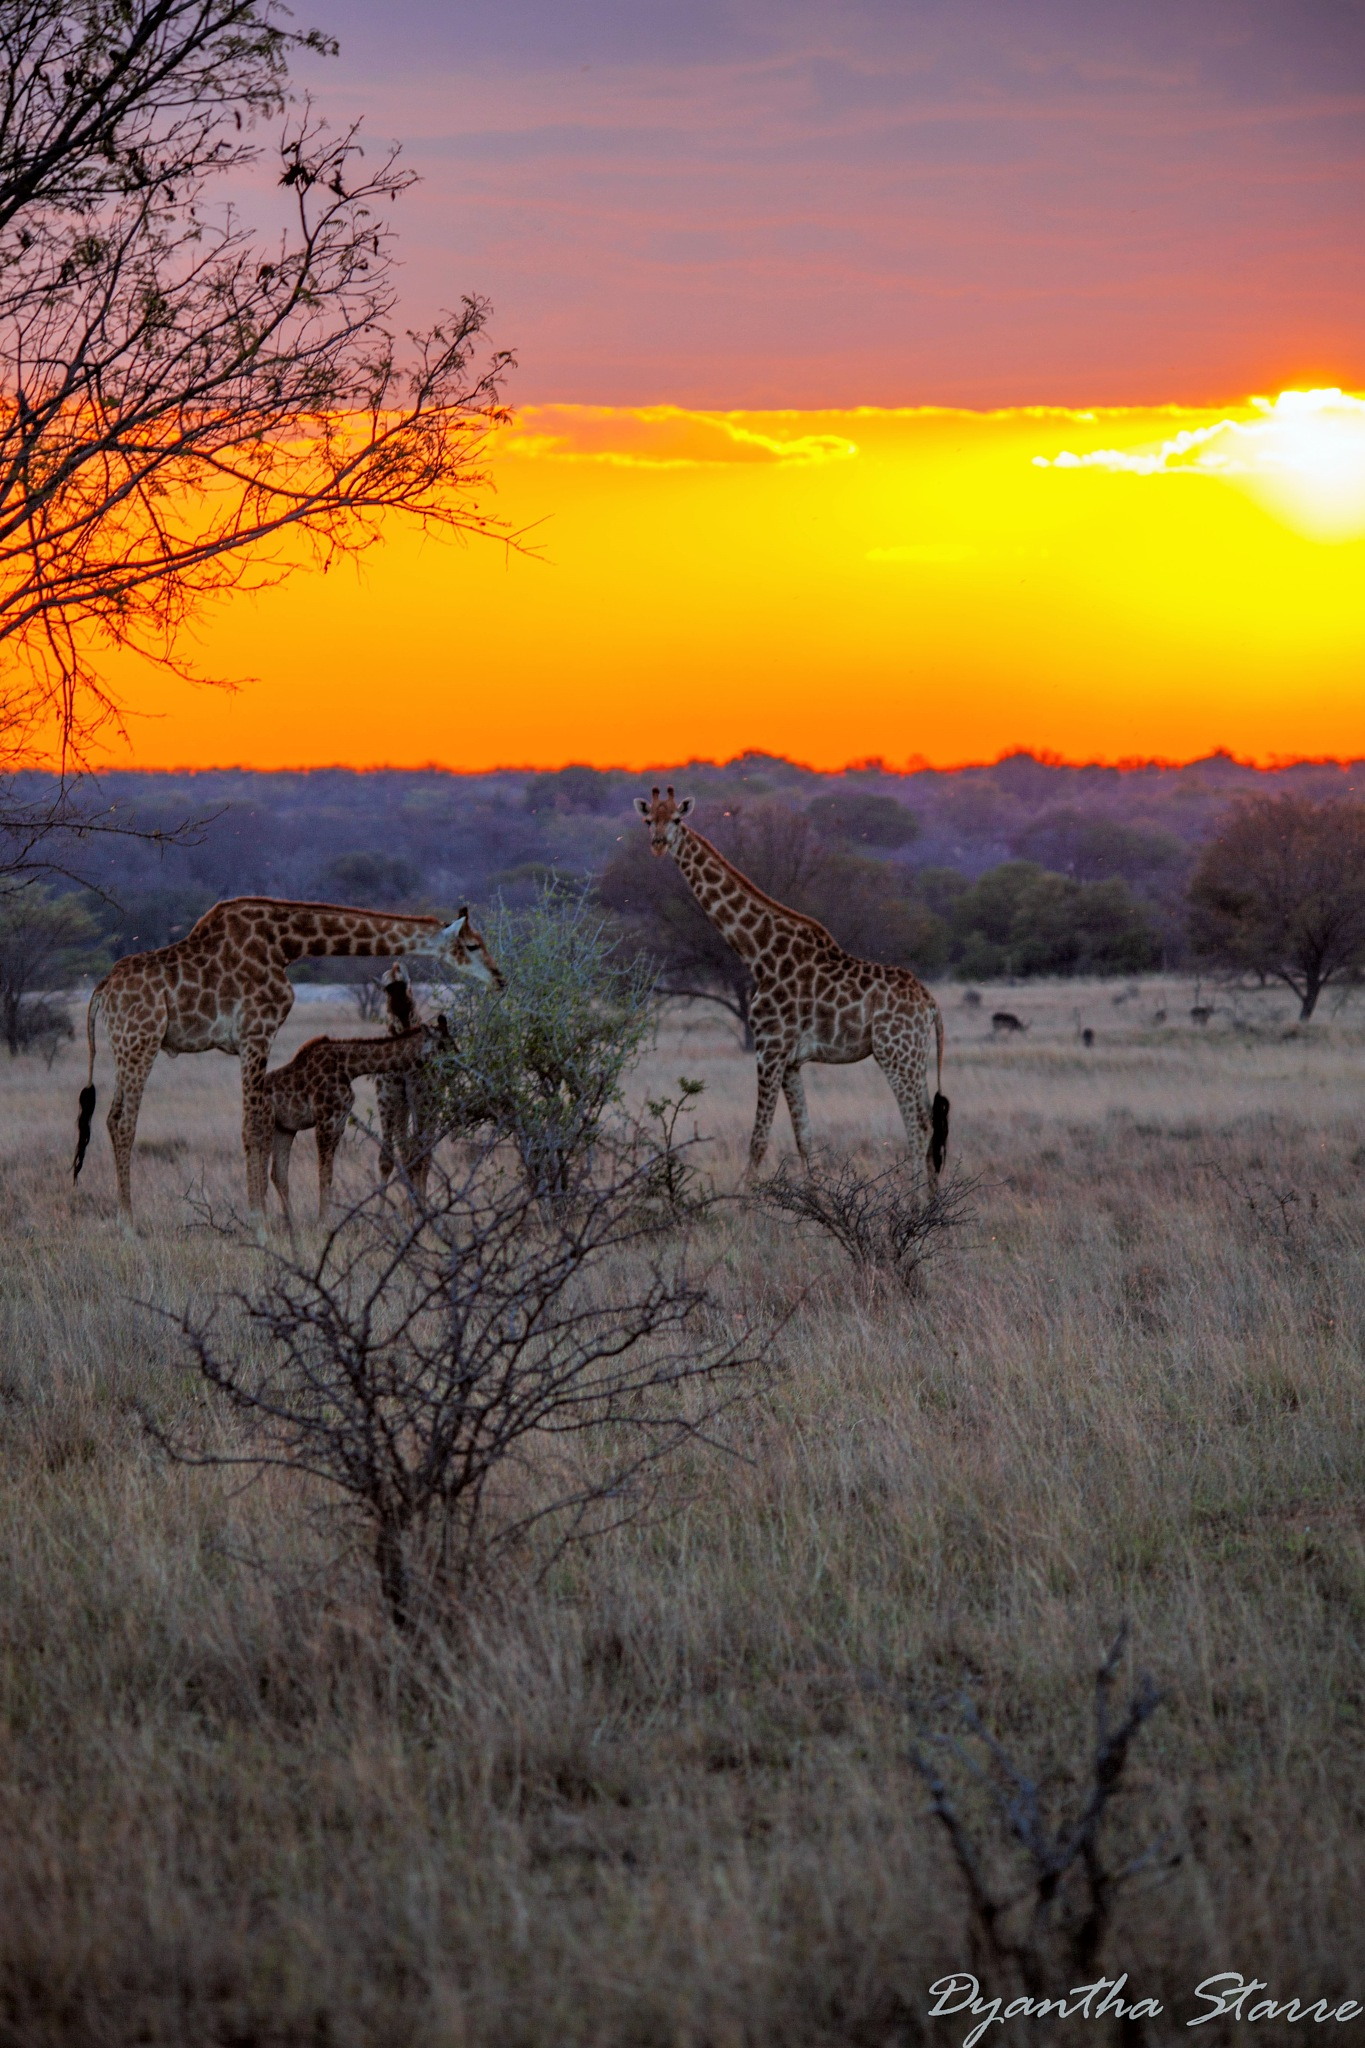 Giraffes at Sunset by Dyantha Starre